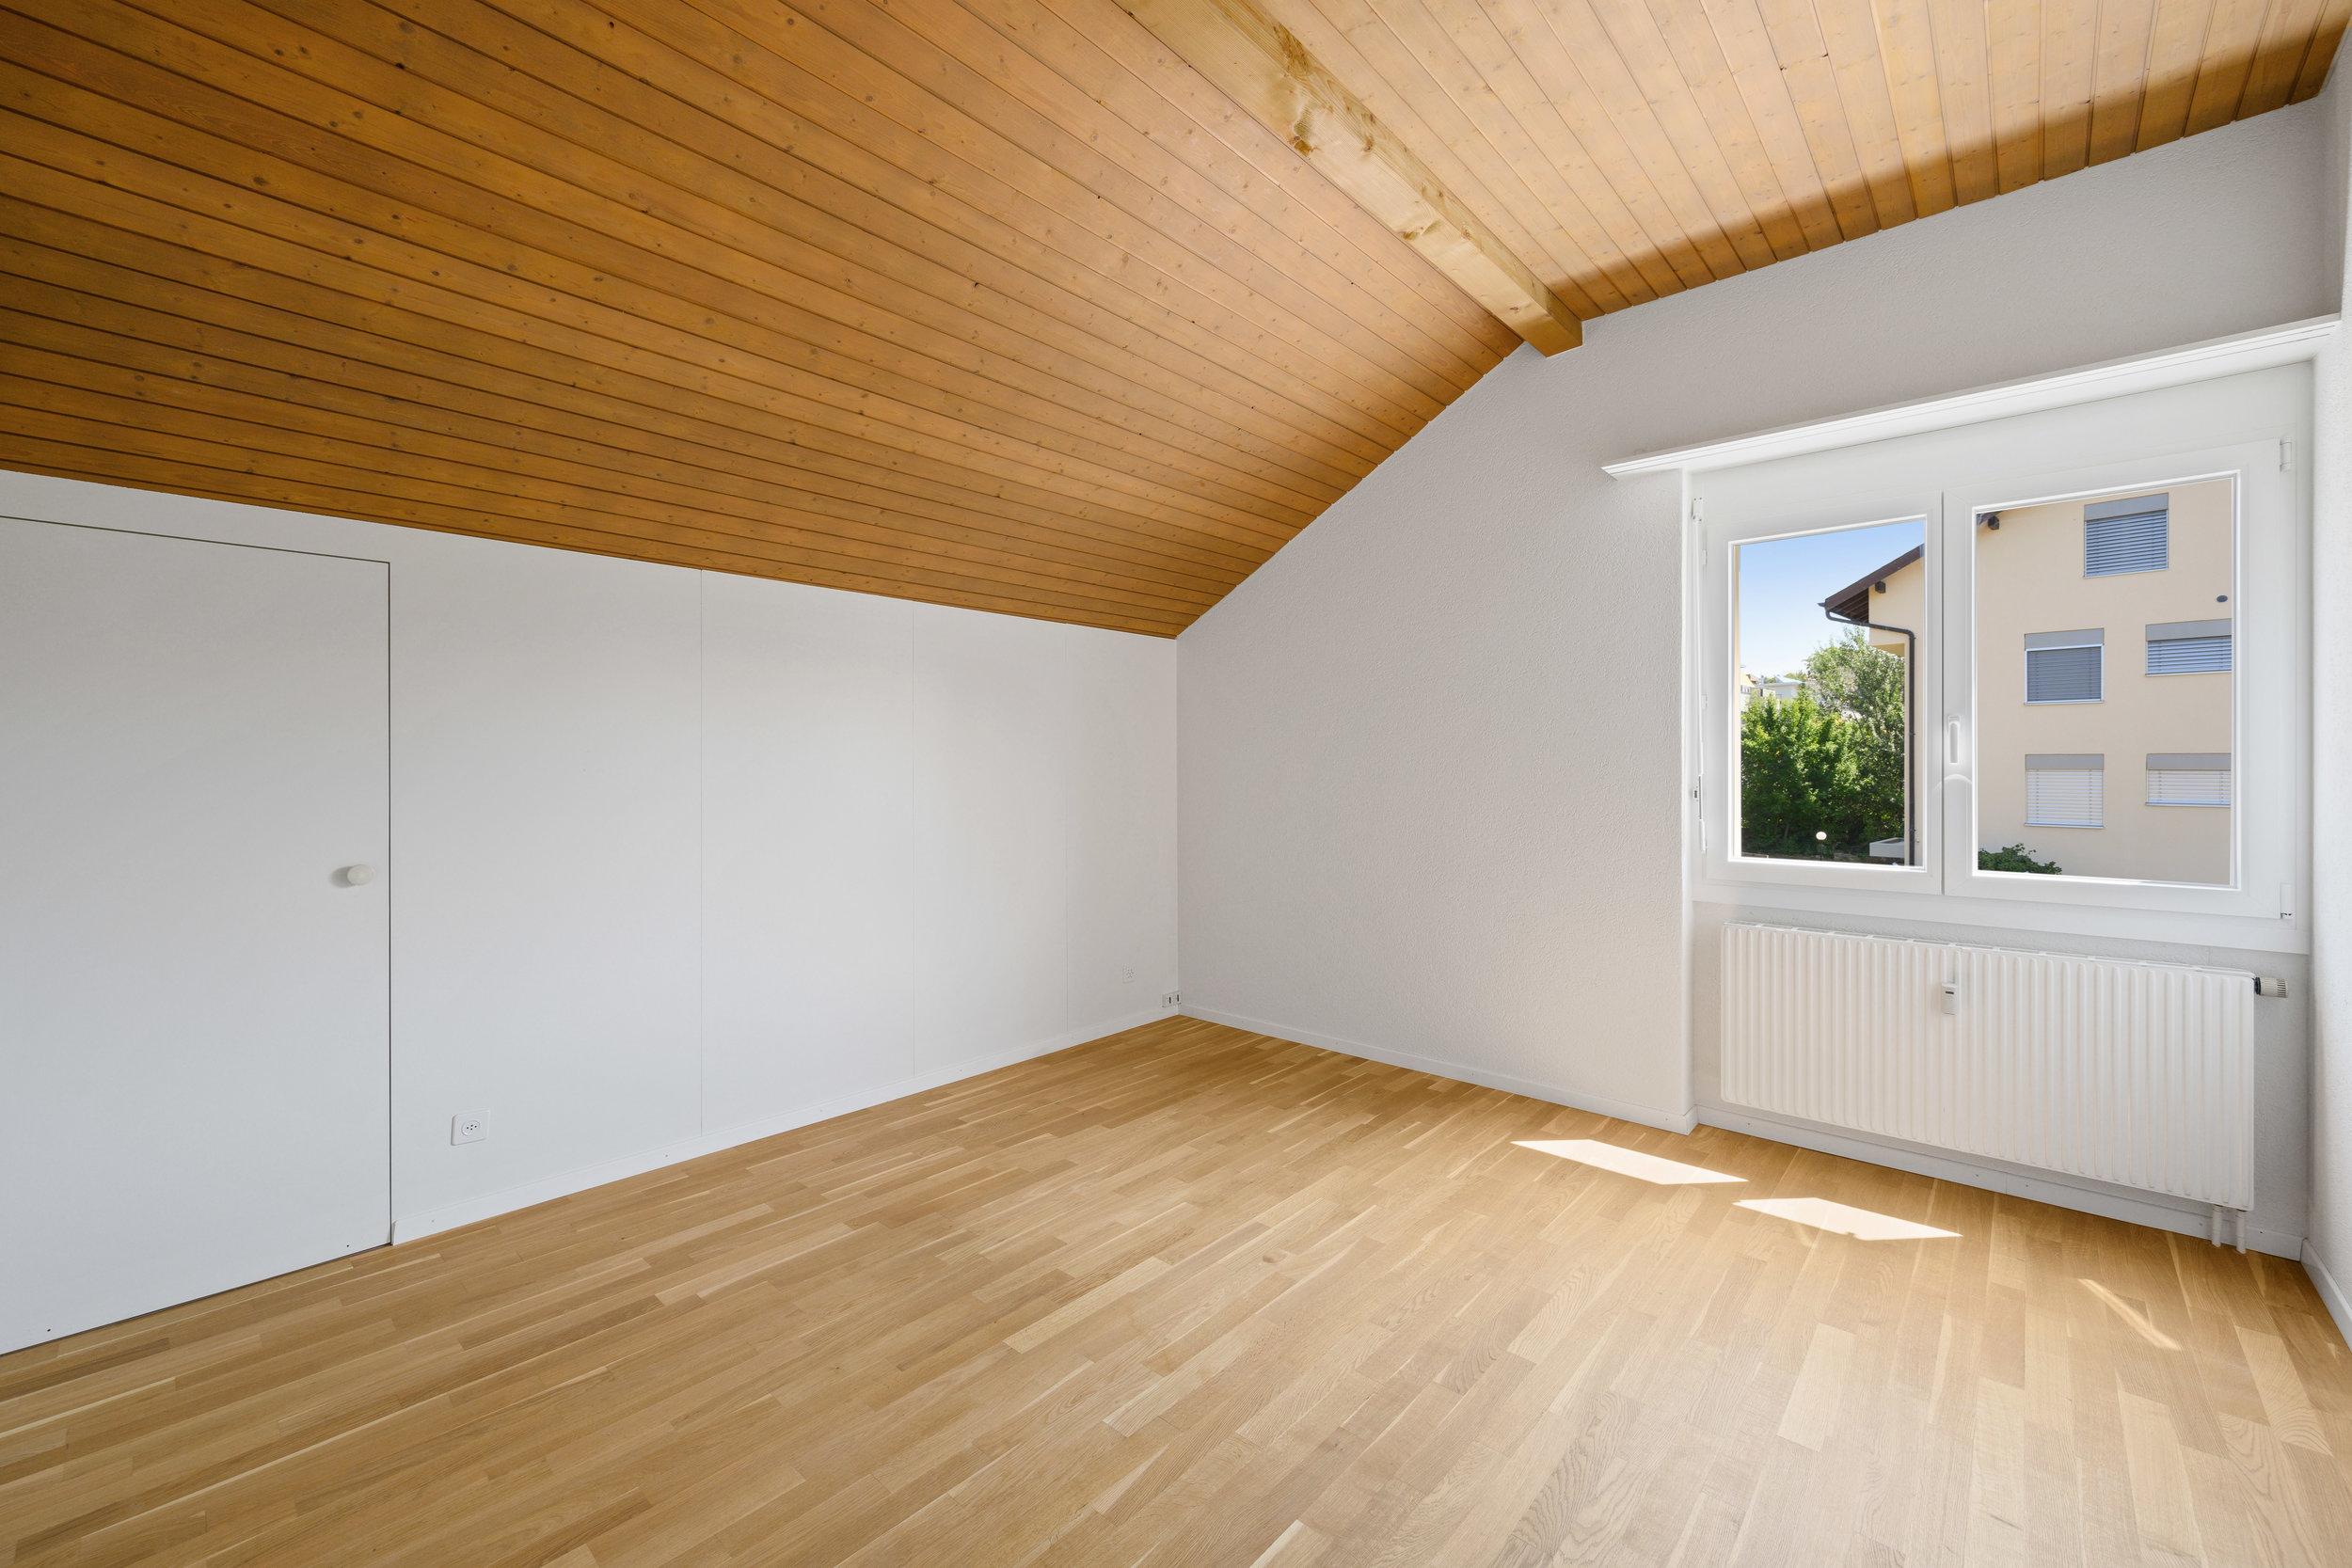 Immobilienfotograf Solothurn.jpg